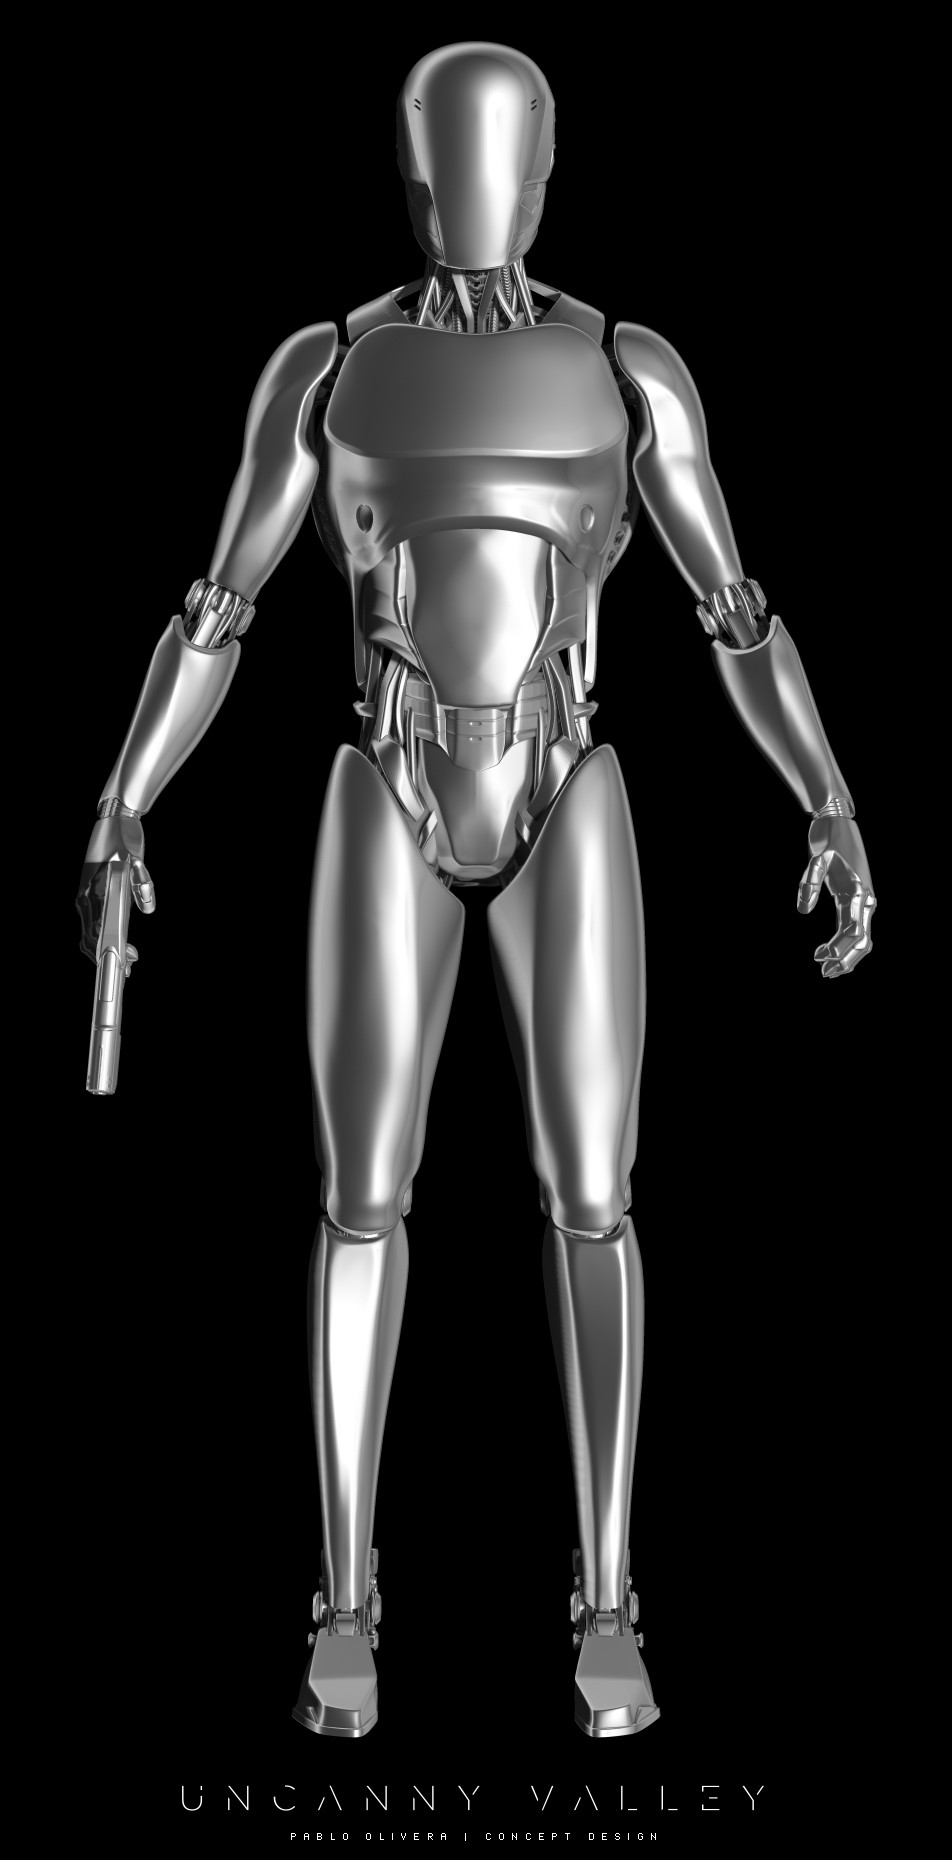 Pablo olivera uncanny valley character design robot 01